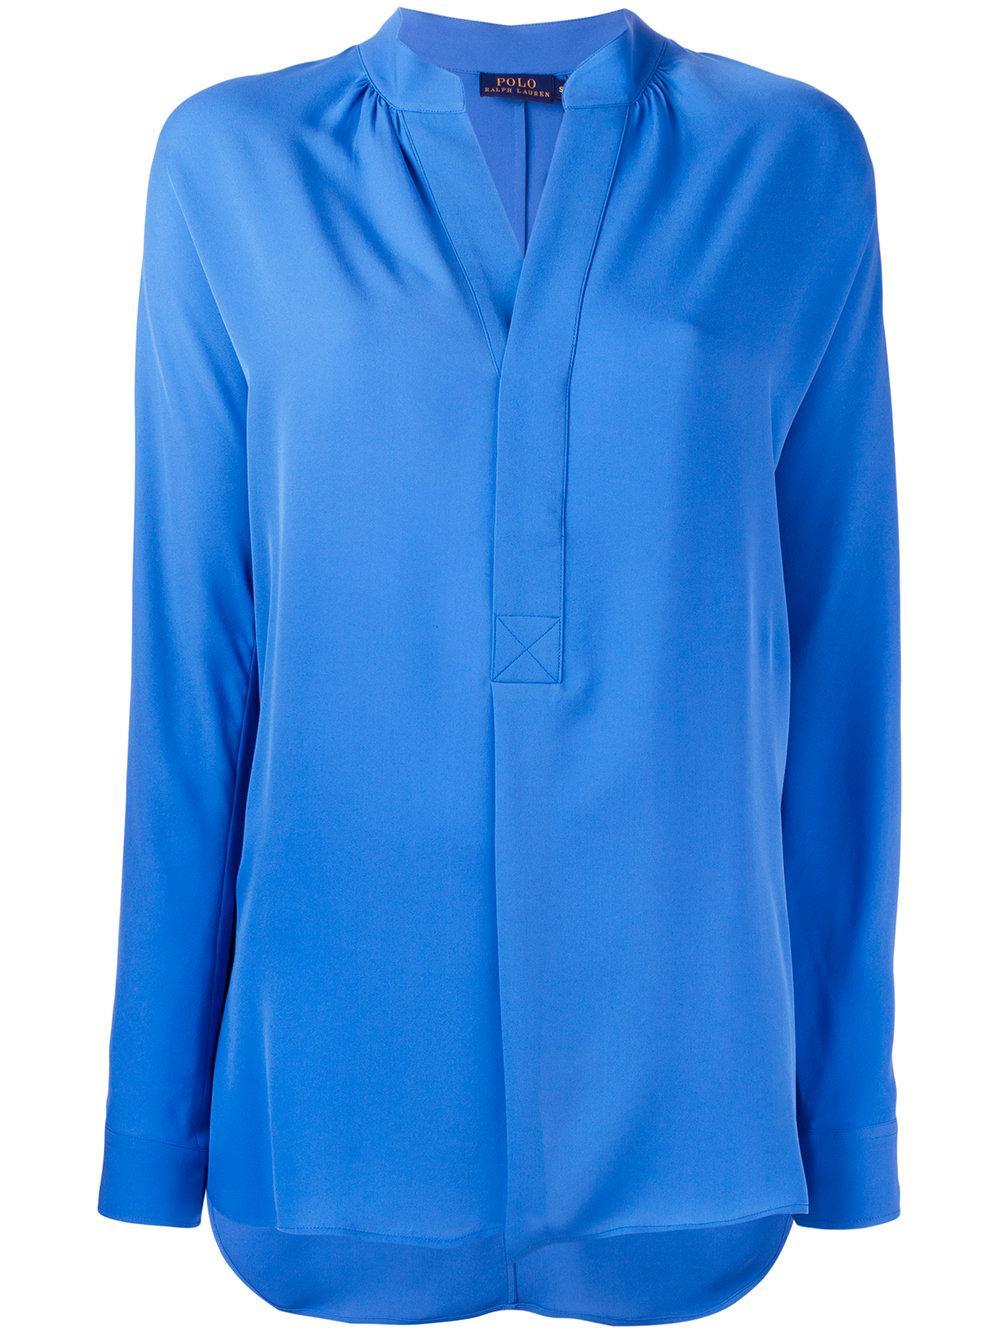 Fantastic Home  Women  Shirts  Polo Ralph Lauren Womens Blouses Amp Tunics